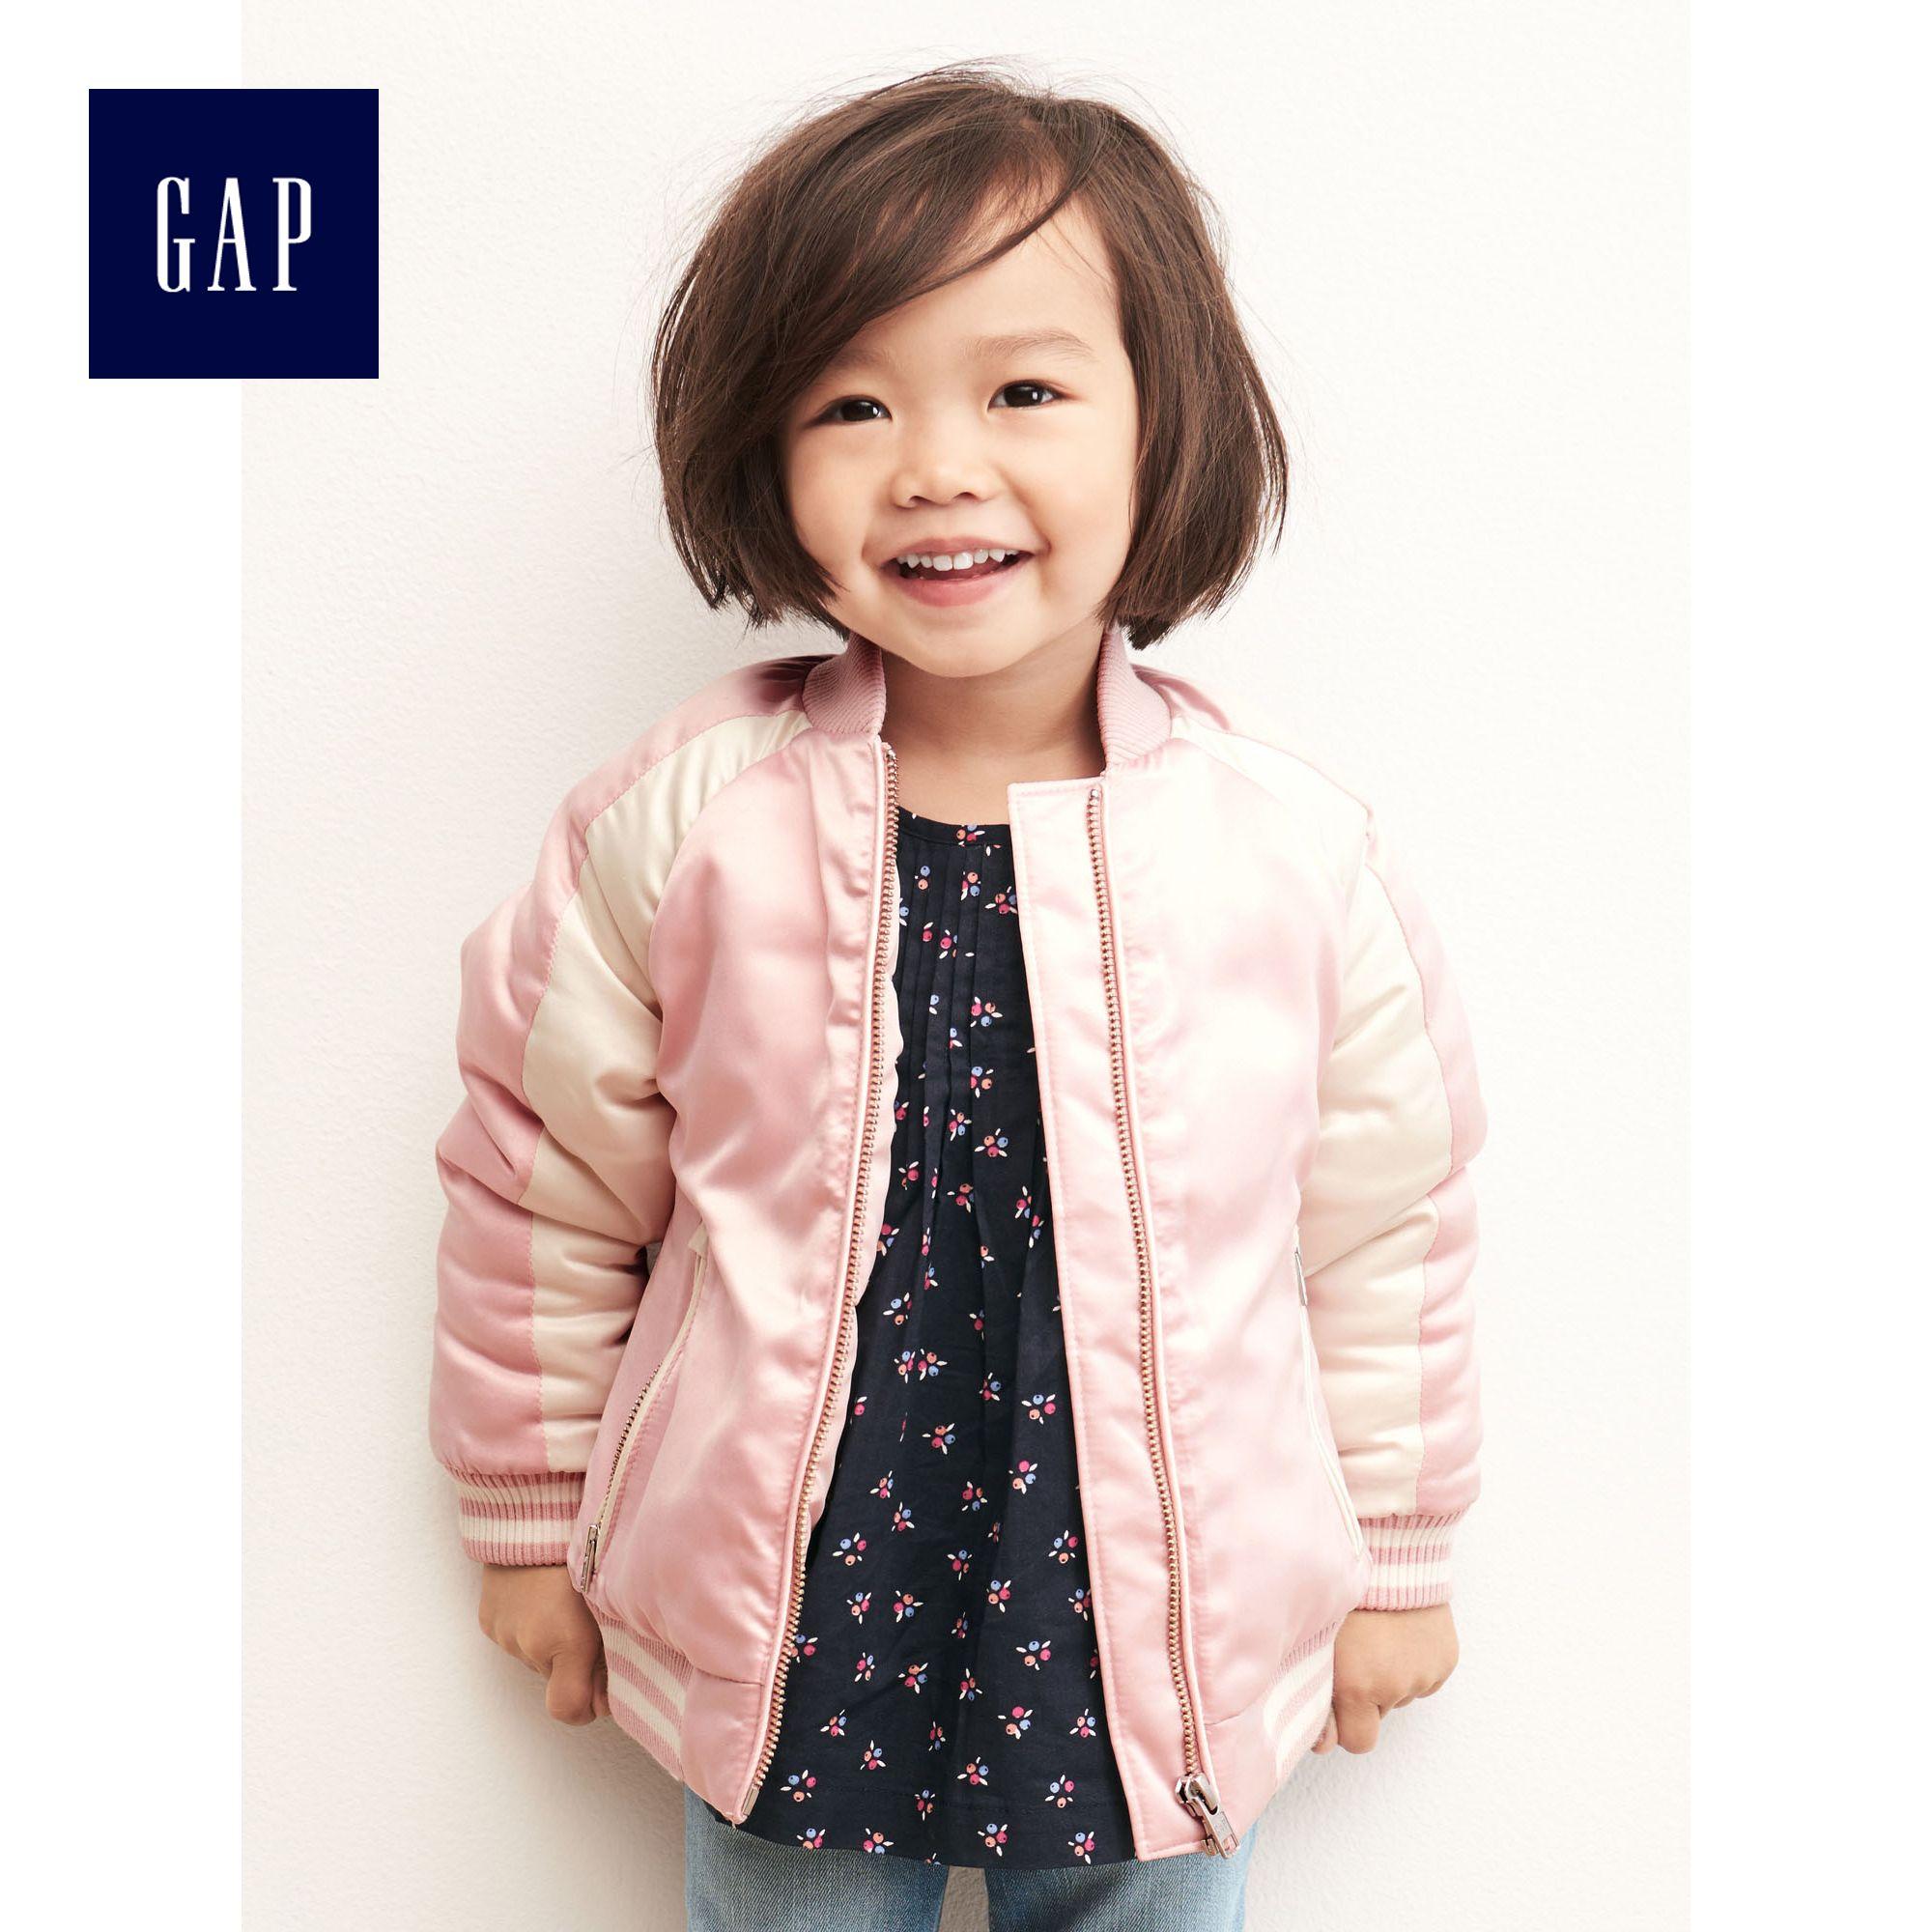 Gap女幼童 拚接 棒球夾克 小童寬鬆棒球服短款上衣 233415 M2